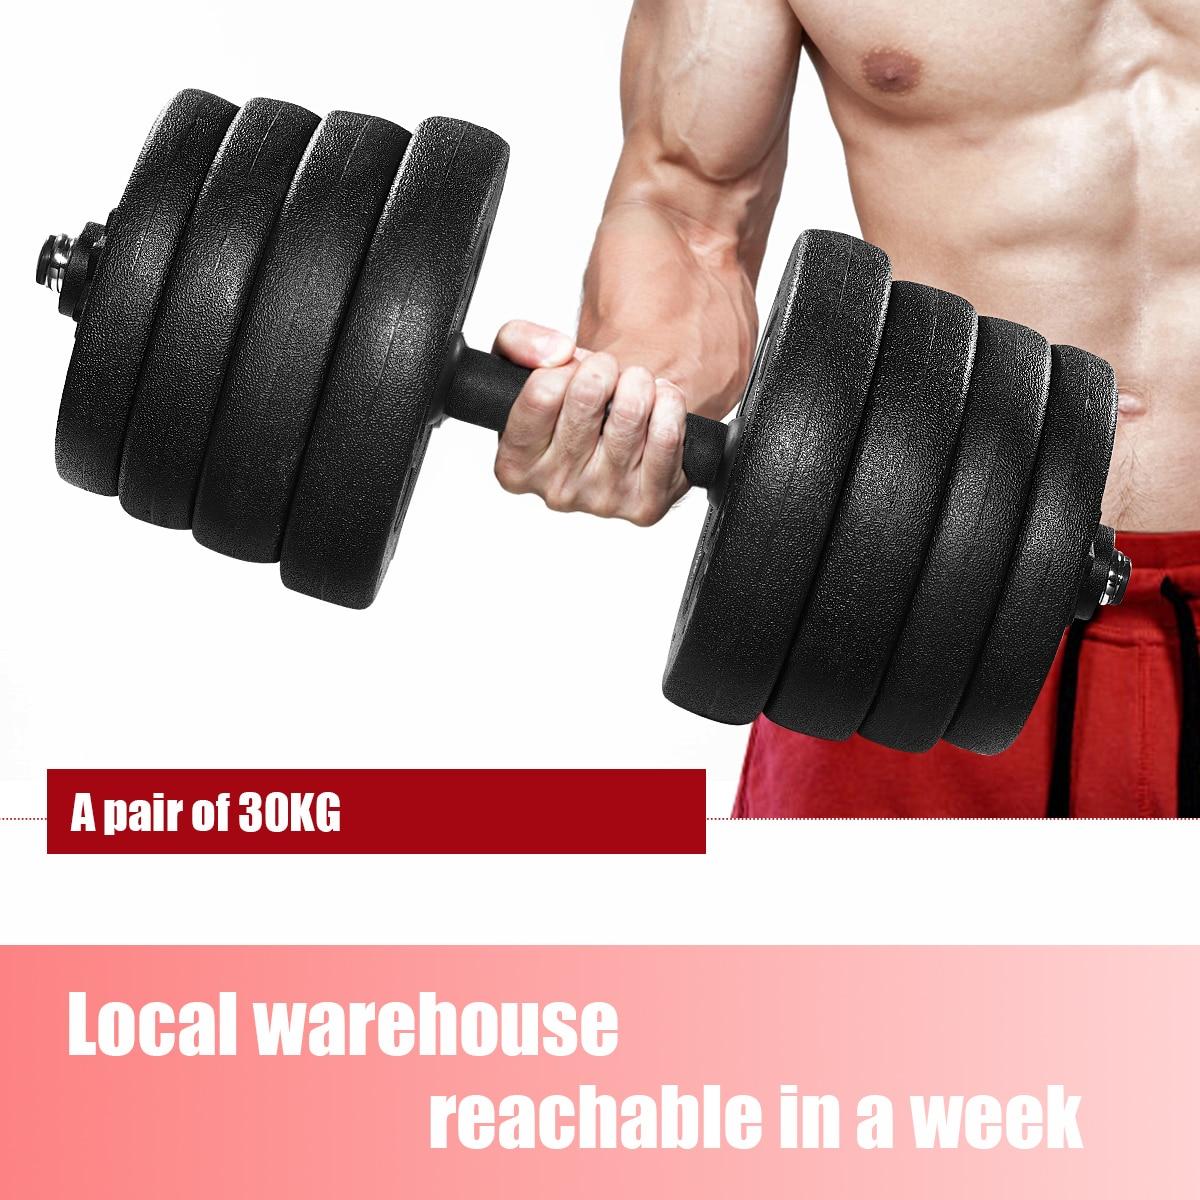 Um par de 30 kg peso haltere conjunto ginásio halteres placas sólida haltere força treino de borracha-revestido halteres equipamentos de fitness